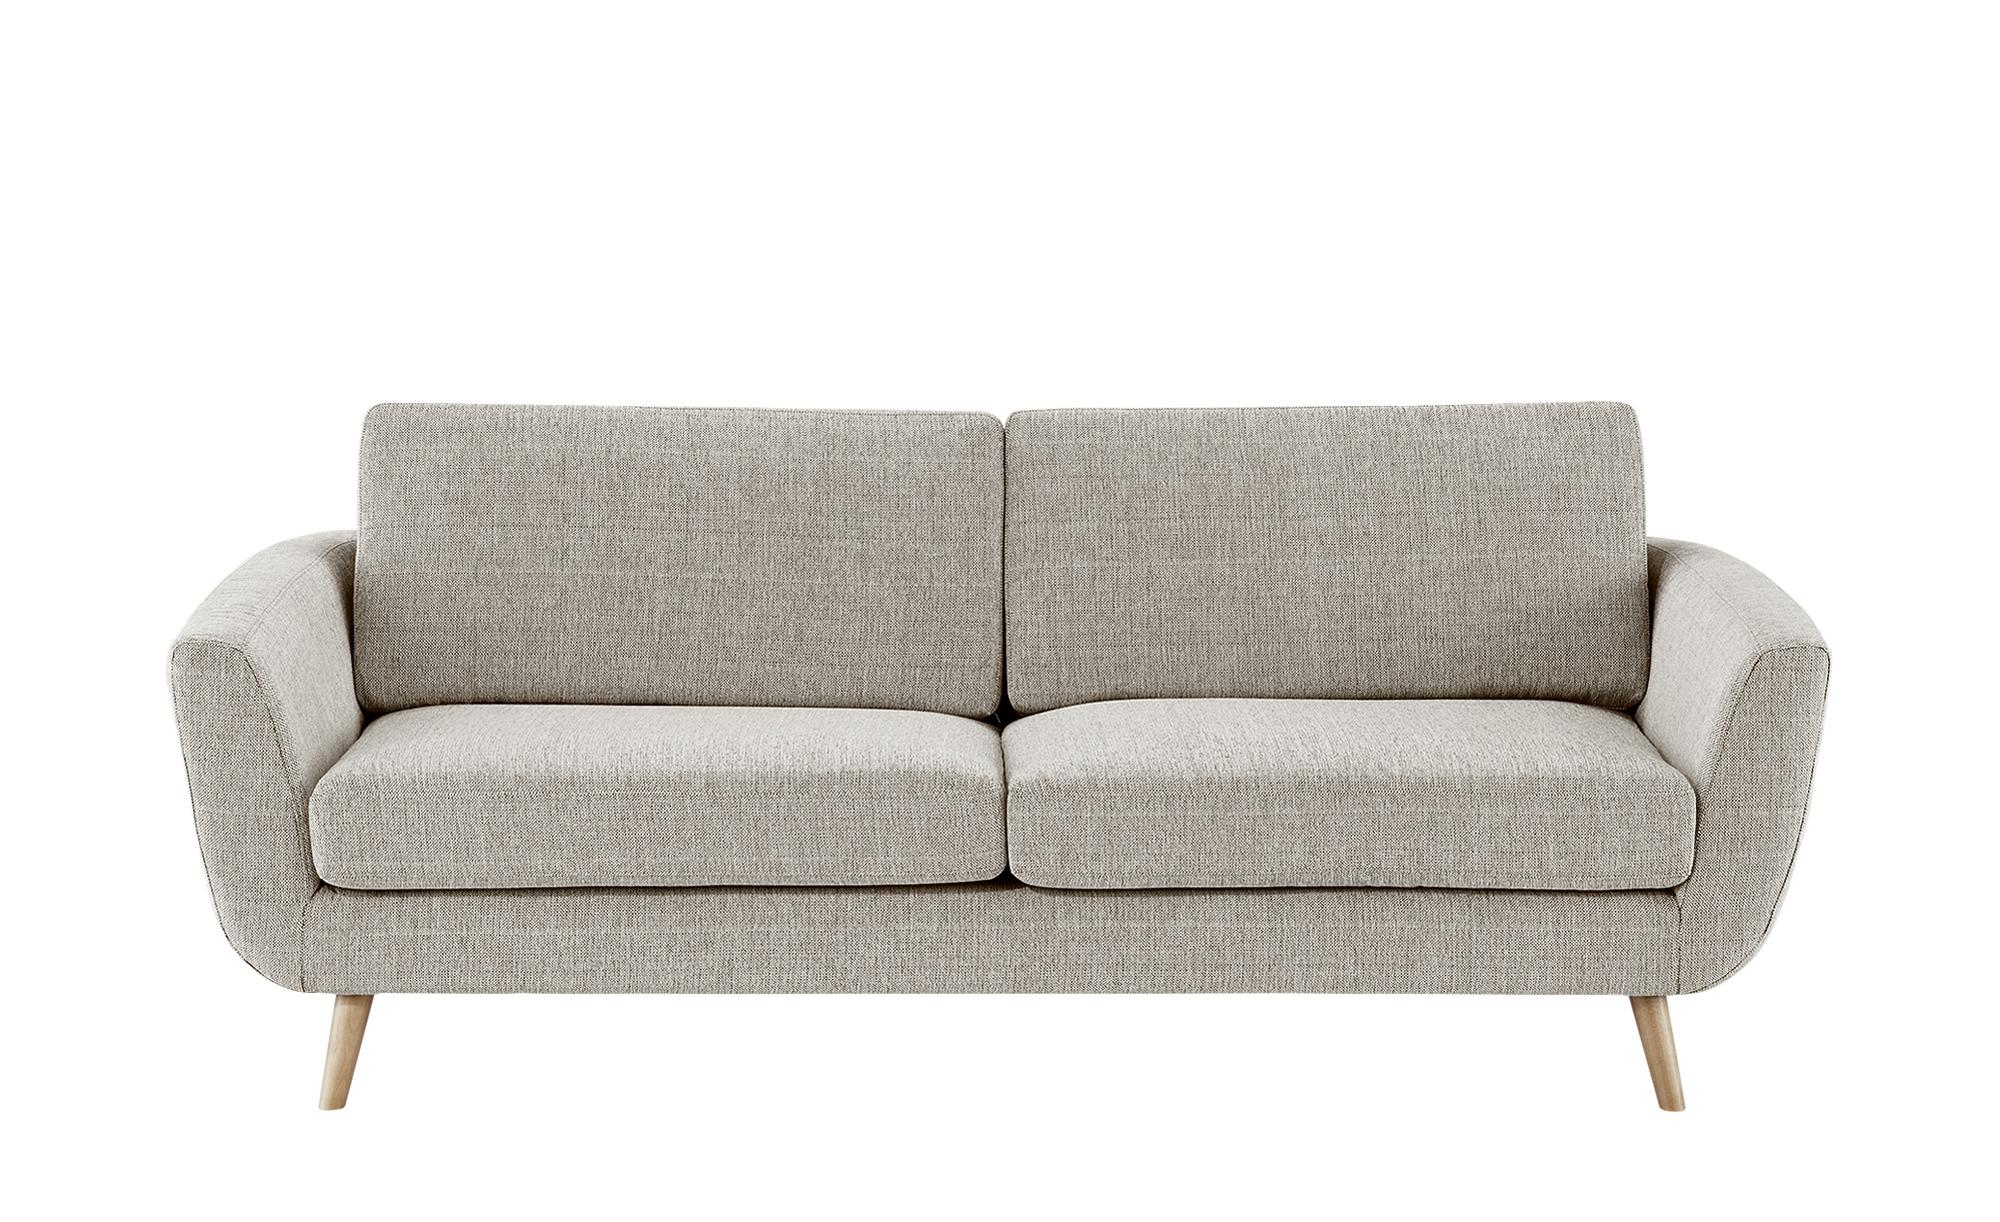 SOHO Sofa braun Webstoff Smilla in 2019 Sofa, Möbel